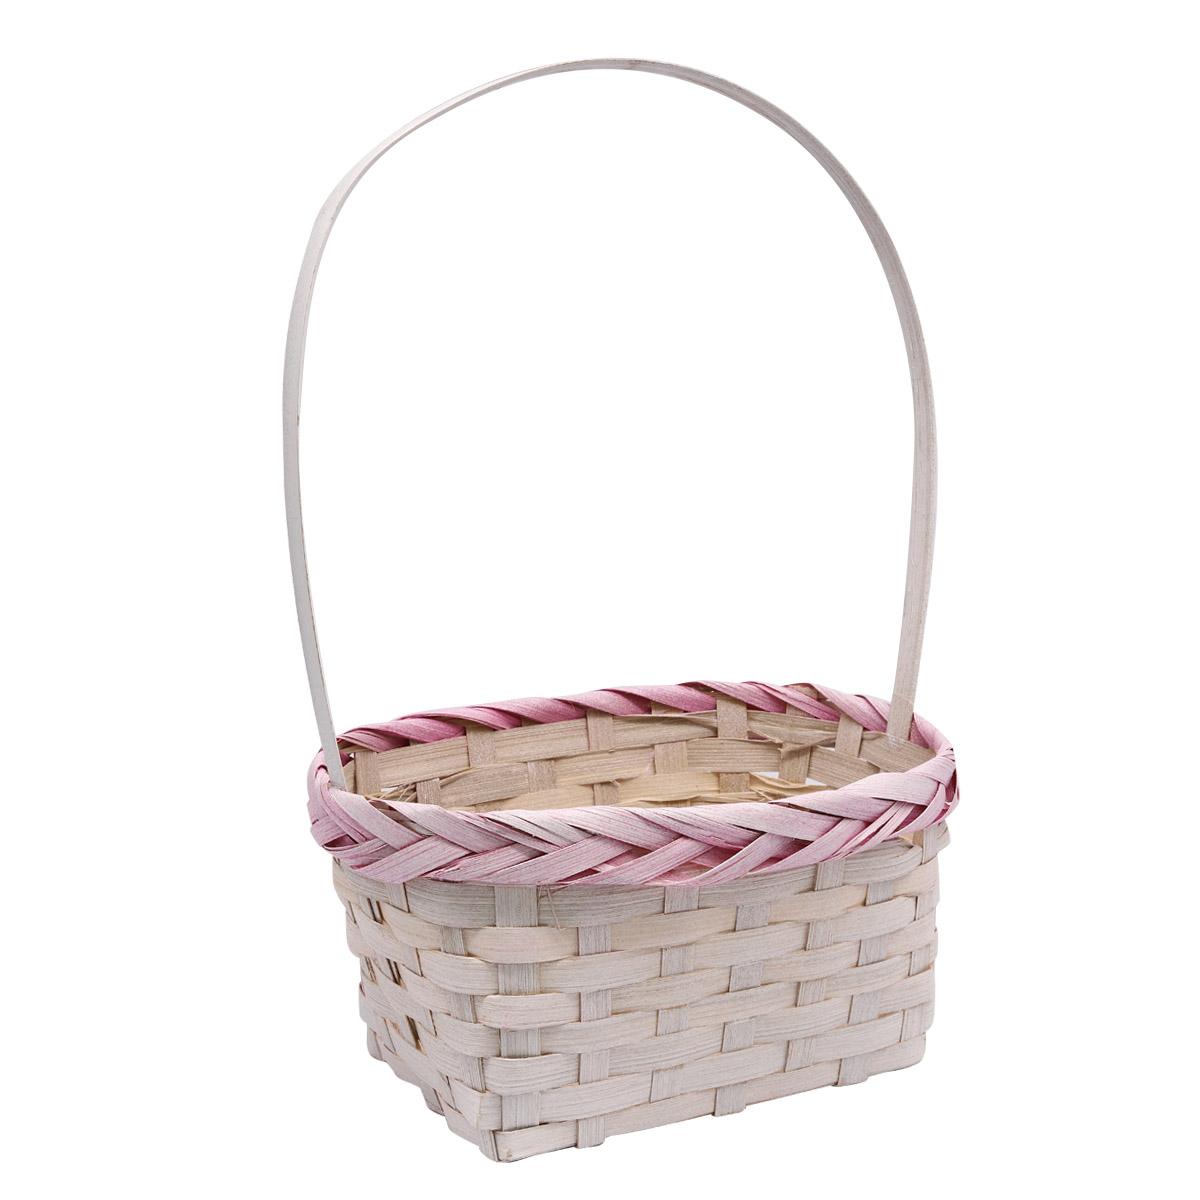 19HJ19094 Корзина плетеная бамбук 20,5*15,5*10*Н30,5см, цв. белый с розовым Астра